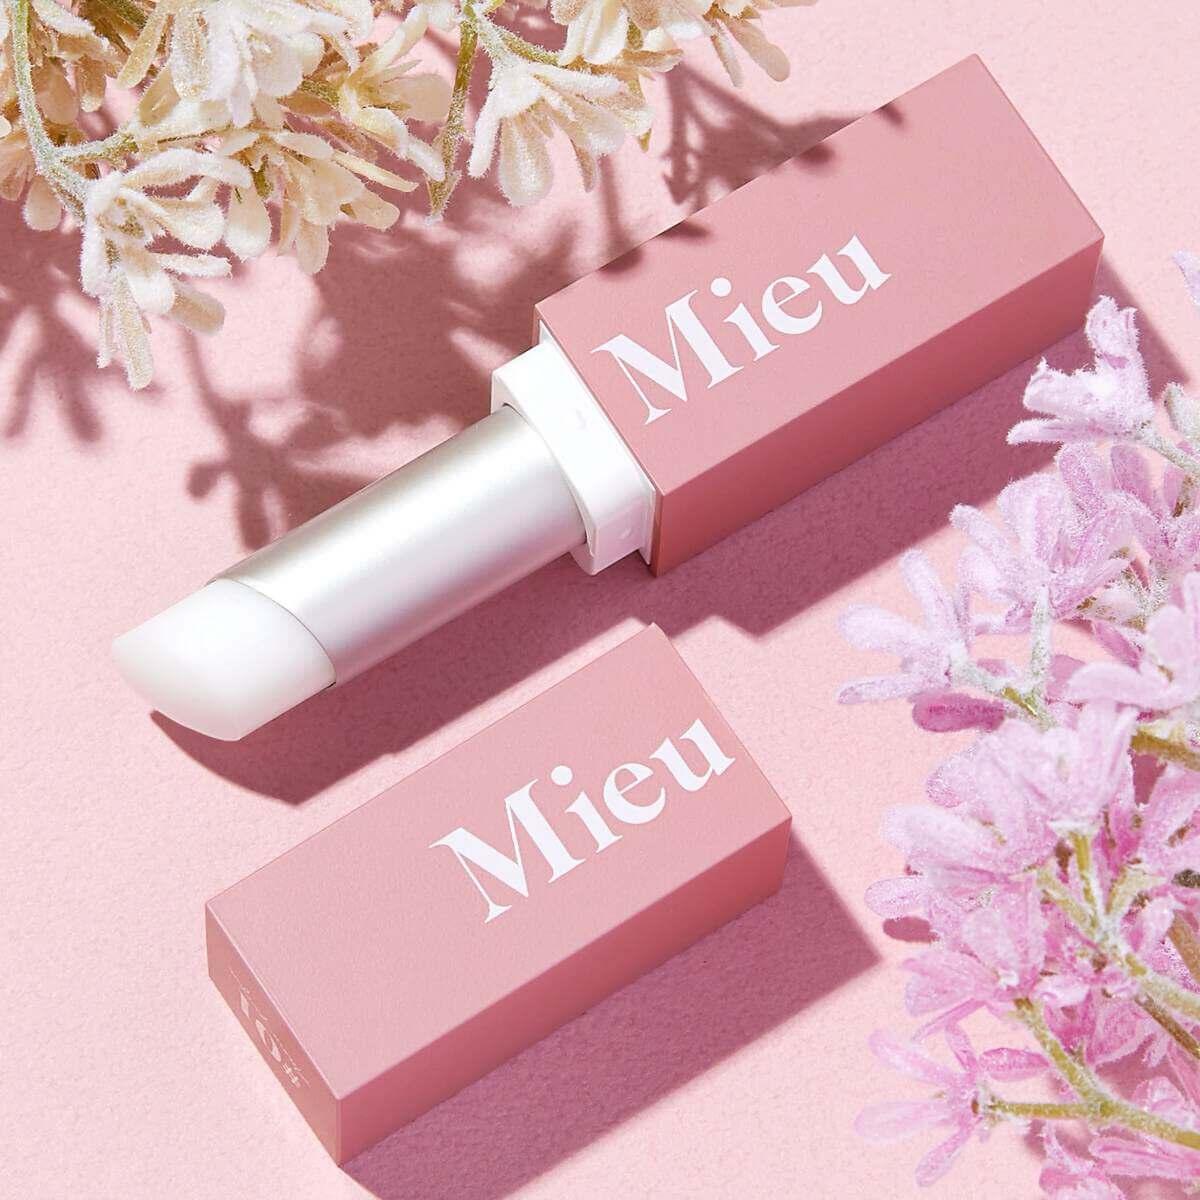 MieuMieuのエスティックのAmour-parfum